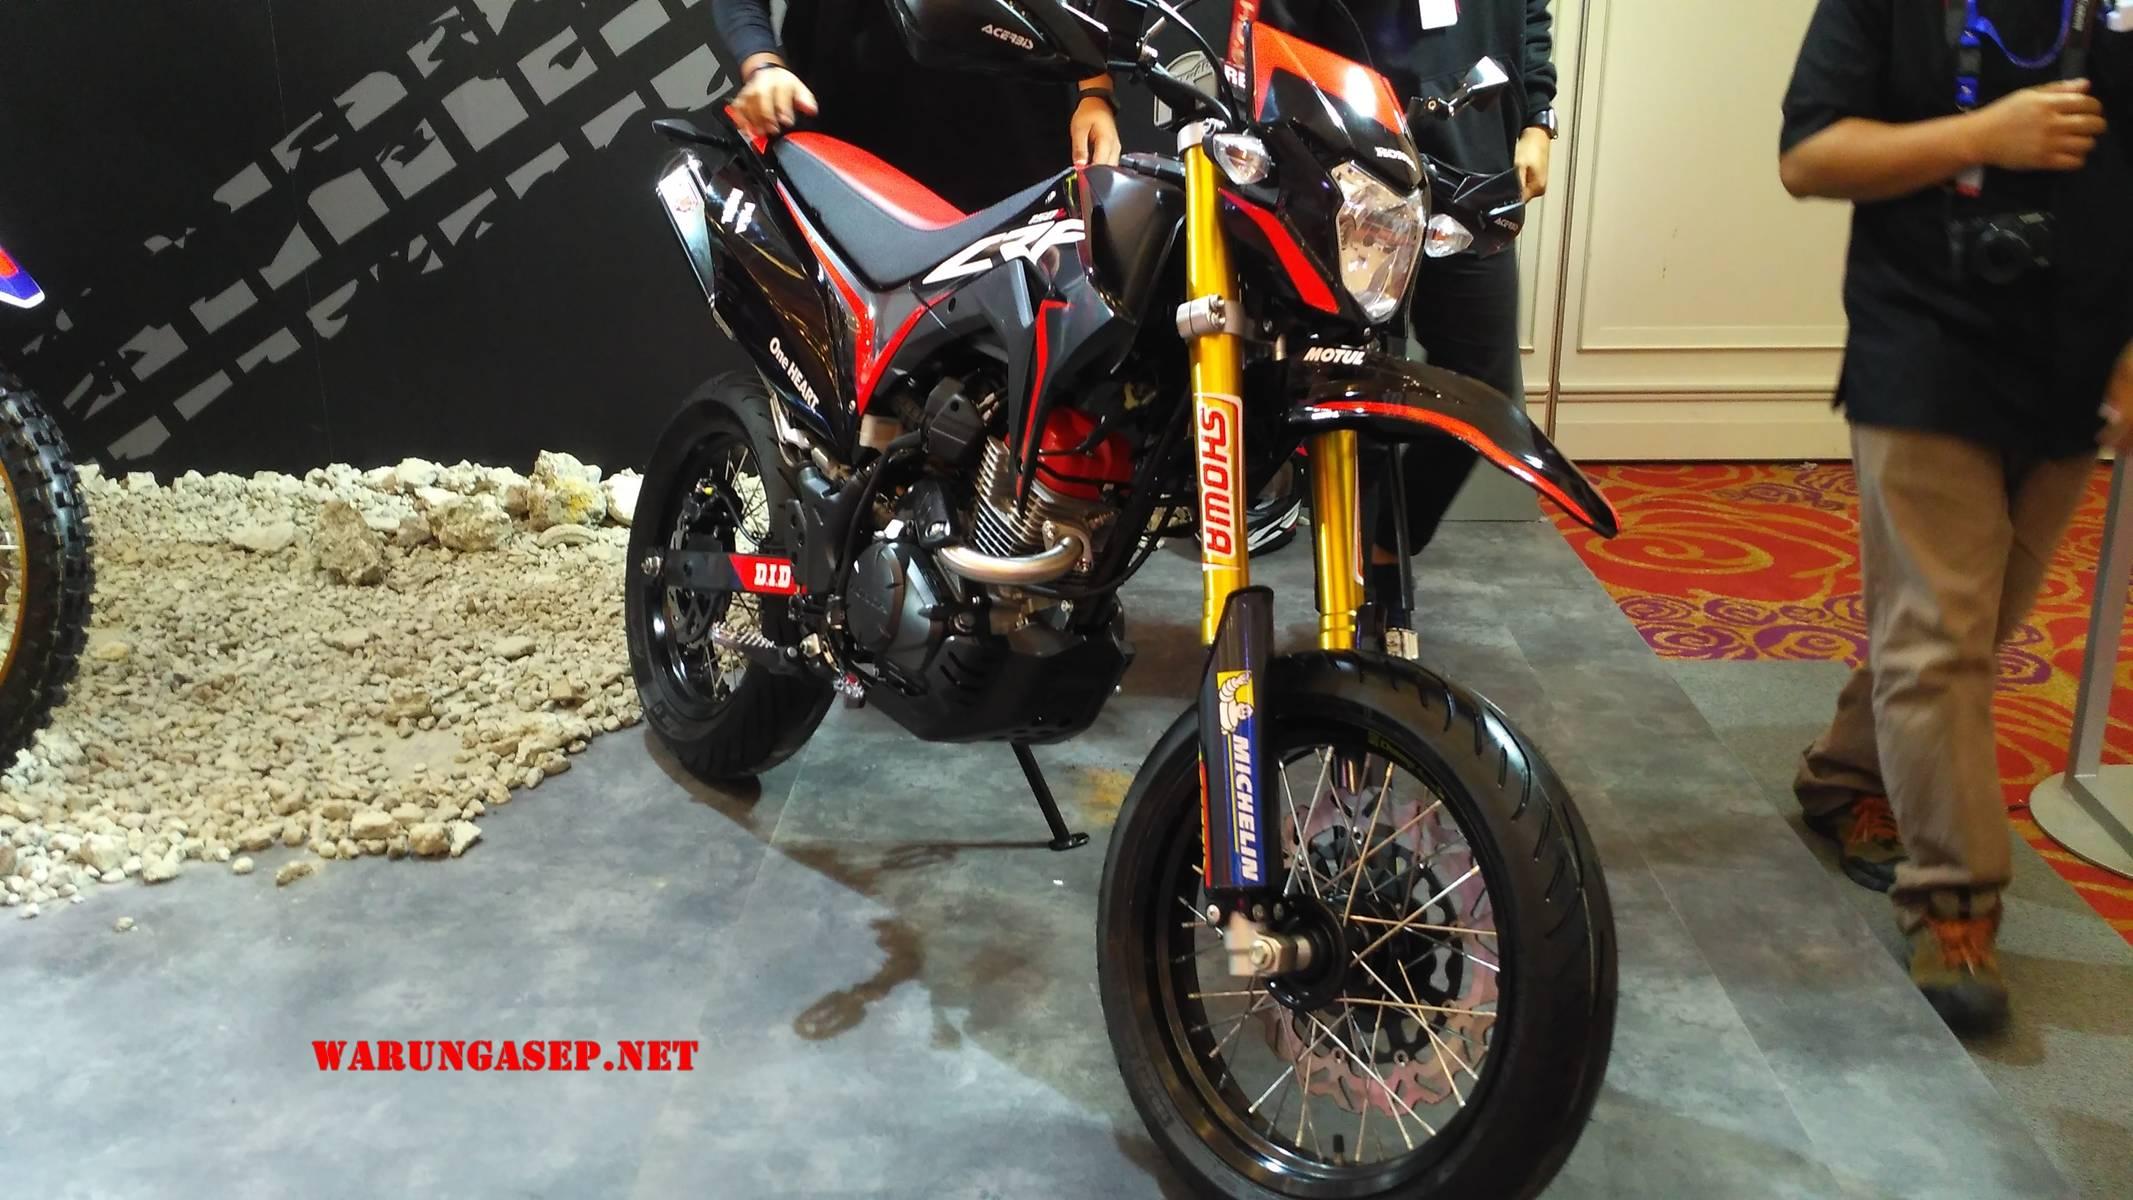 Honda Crf150l 2018 104 Warungasep WARUNGASEP